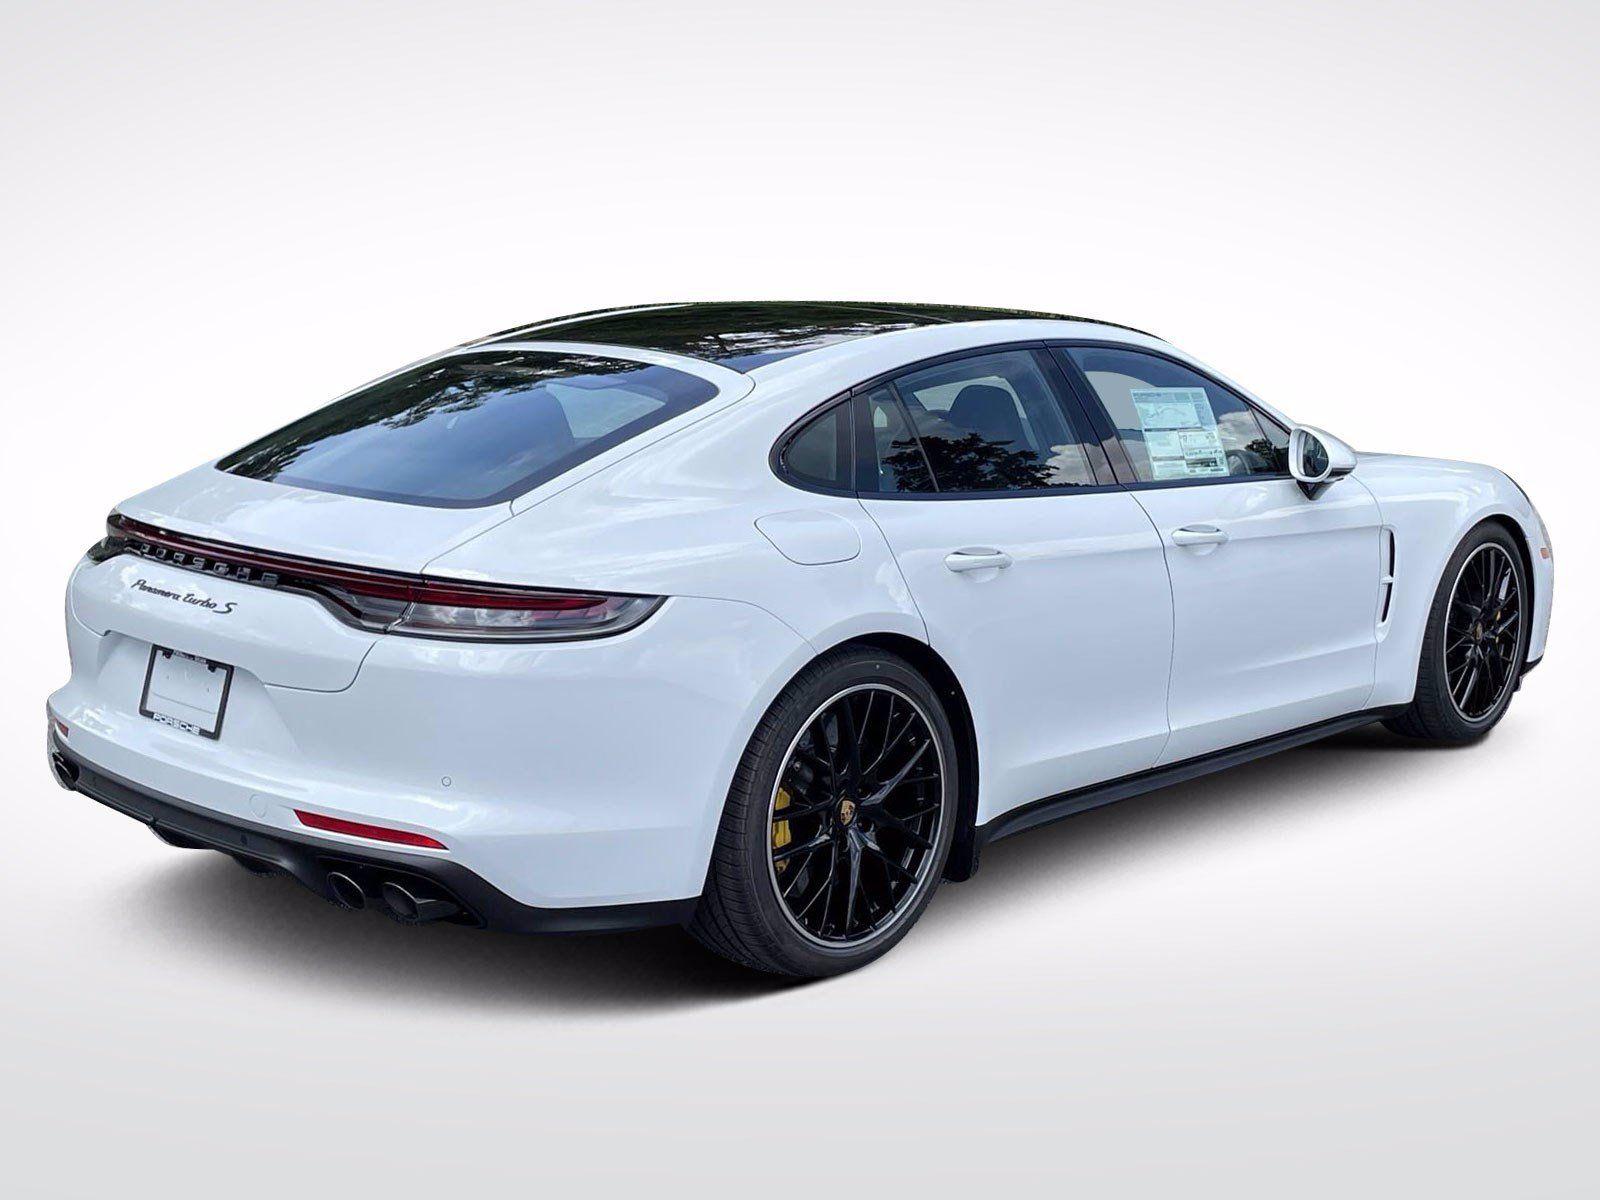 2021 Porsche Panamera Turbo S – 5